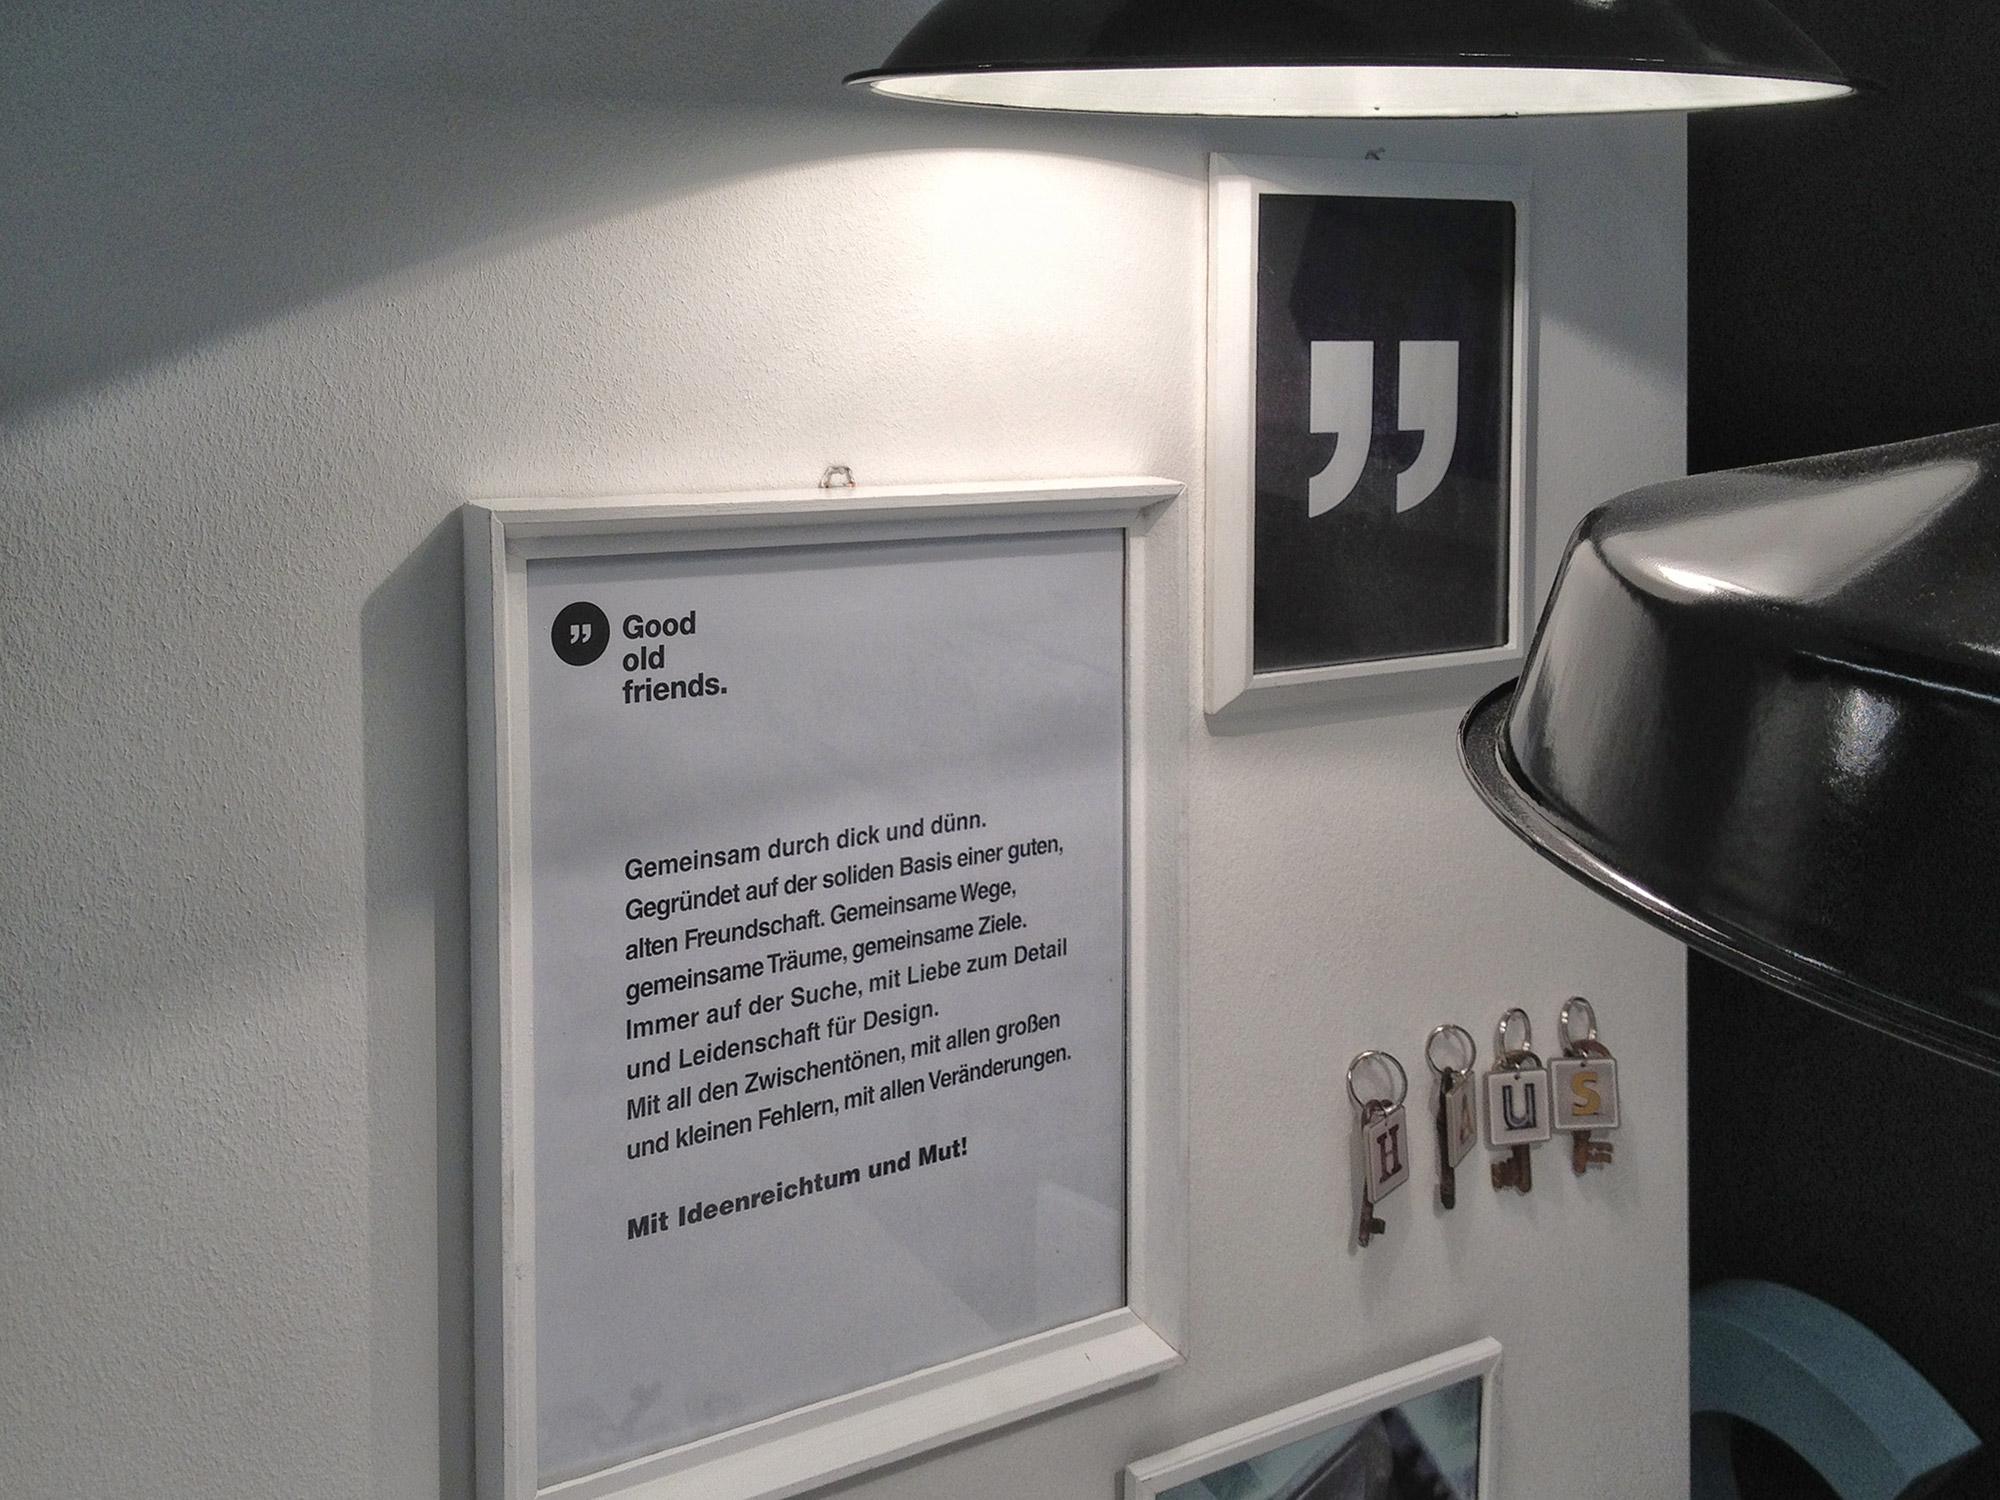 04-DSnulldrei-Dirk-Schaechter-Gof-German-Brand-Award